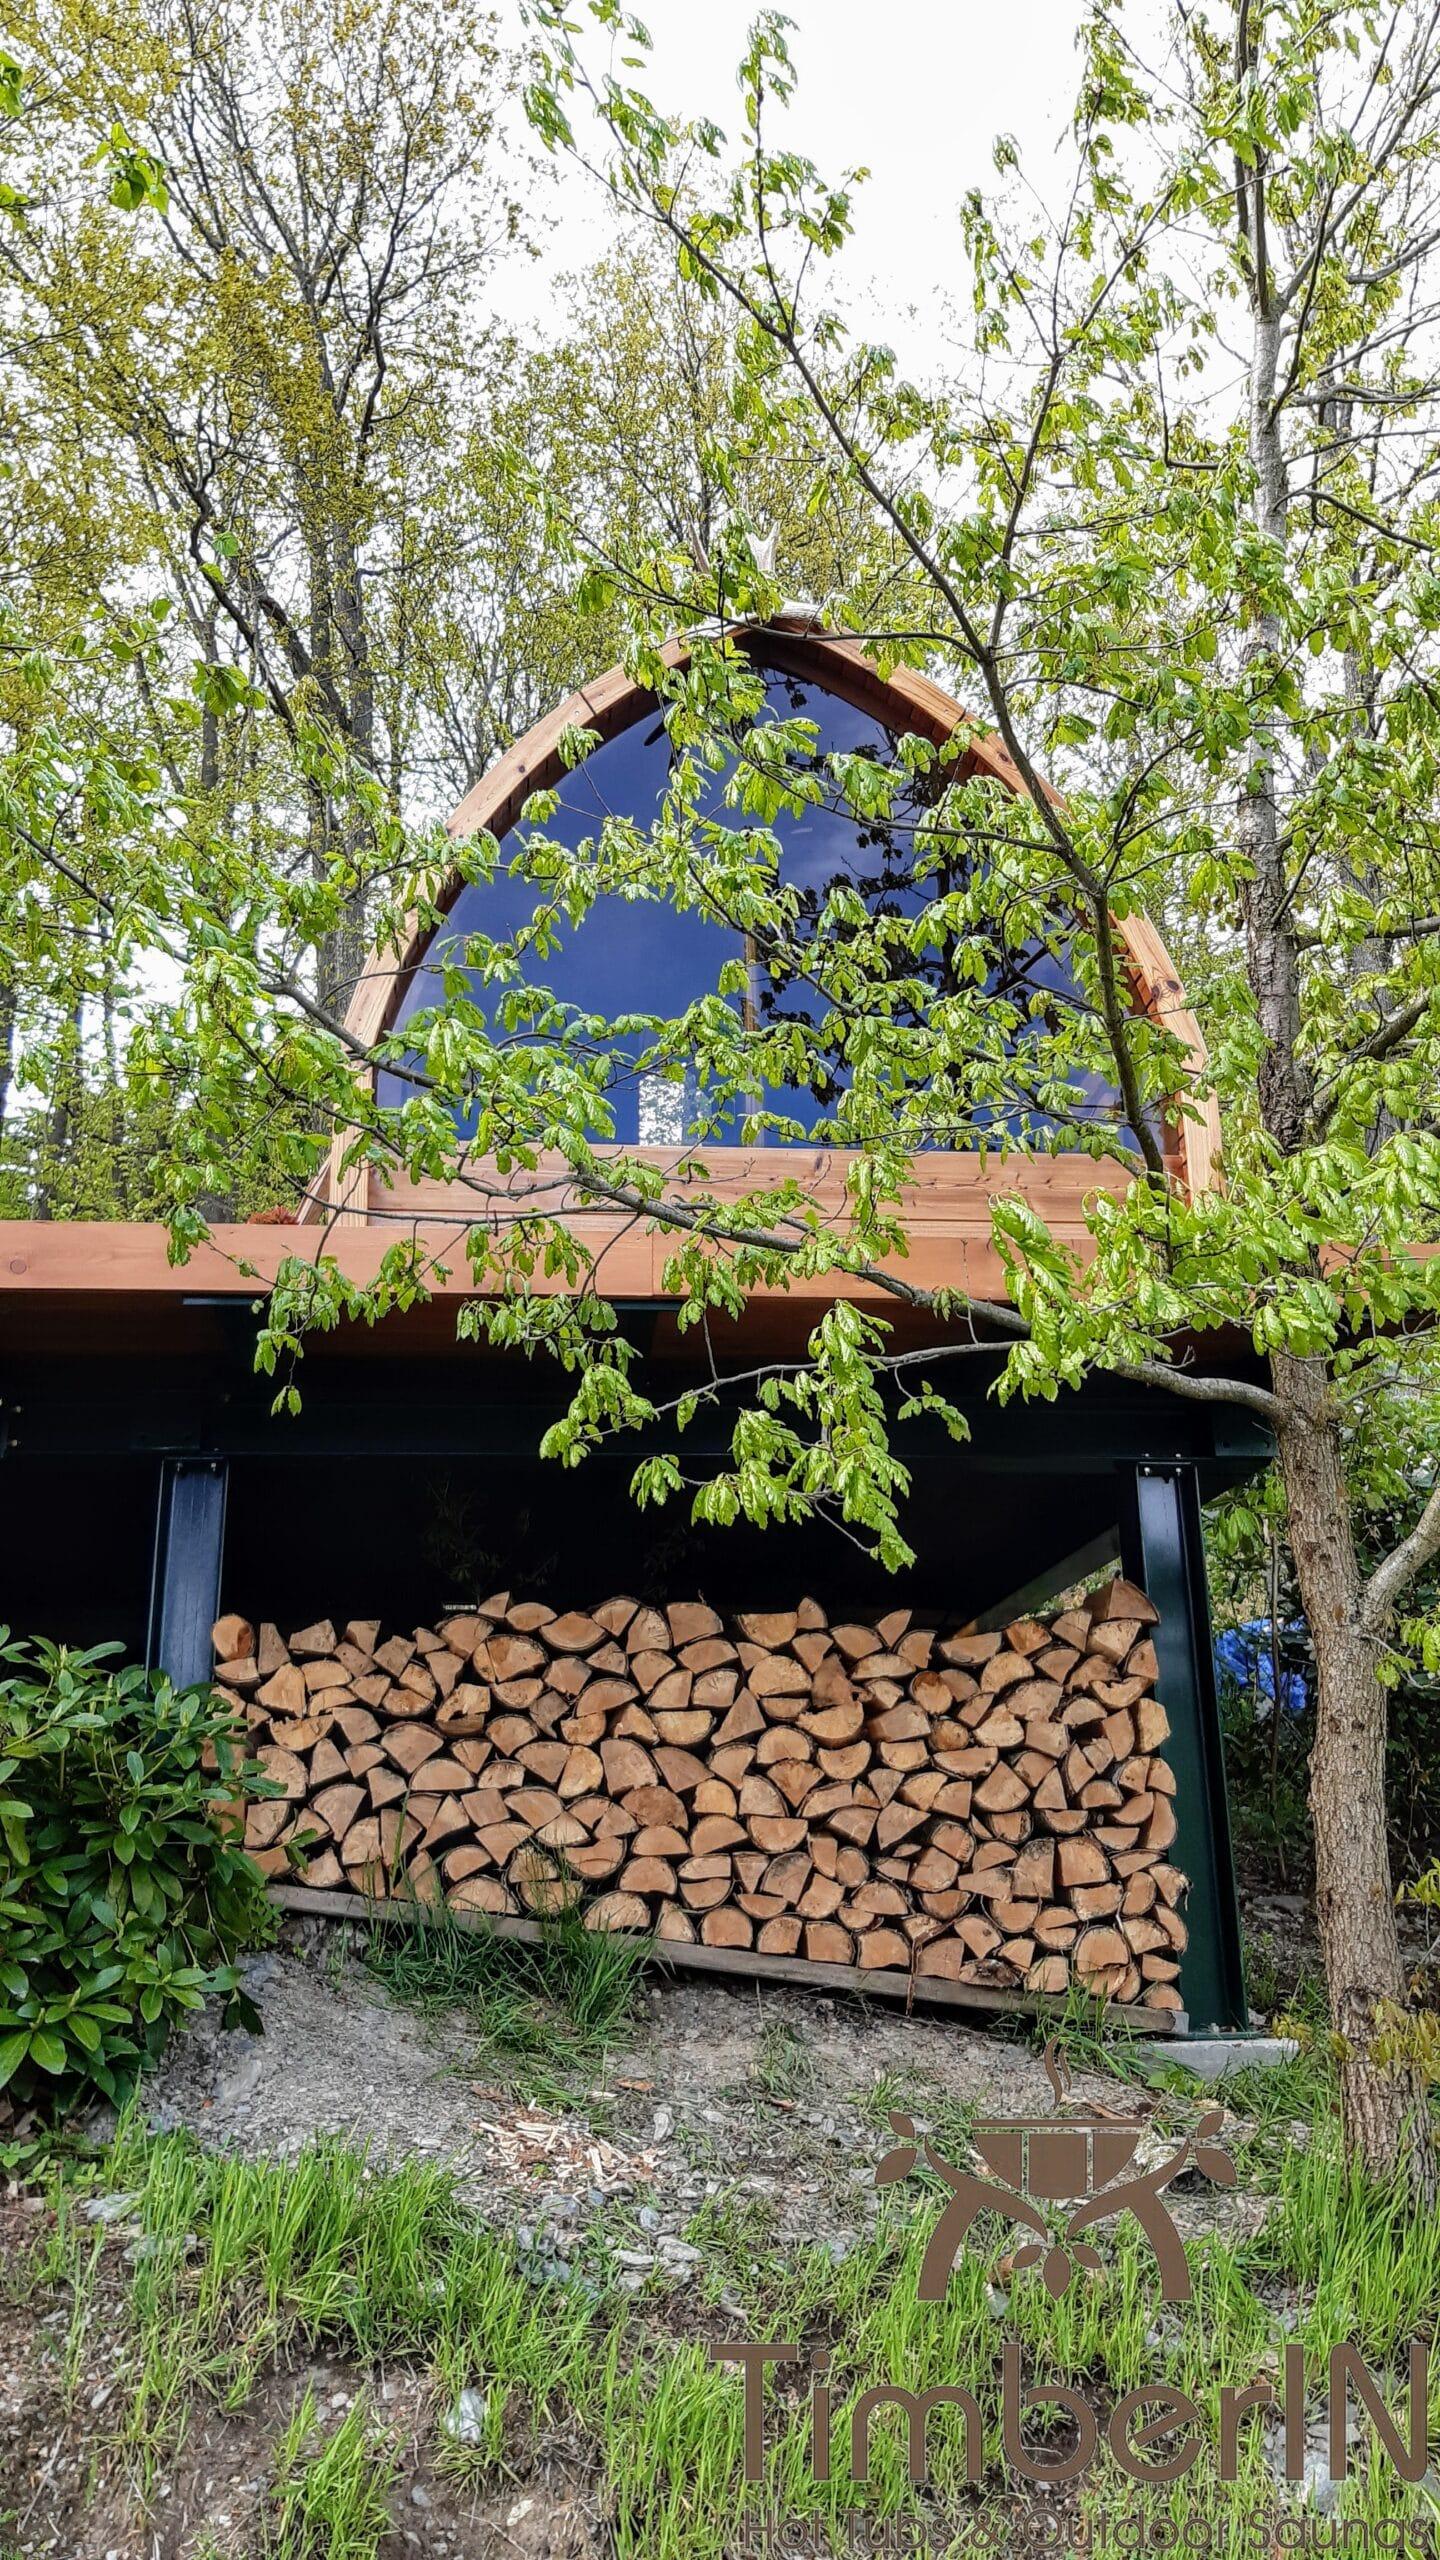 Finnische Aussensauna Gartensauna Pod 5 1 scaled